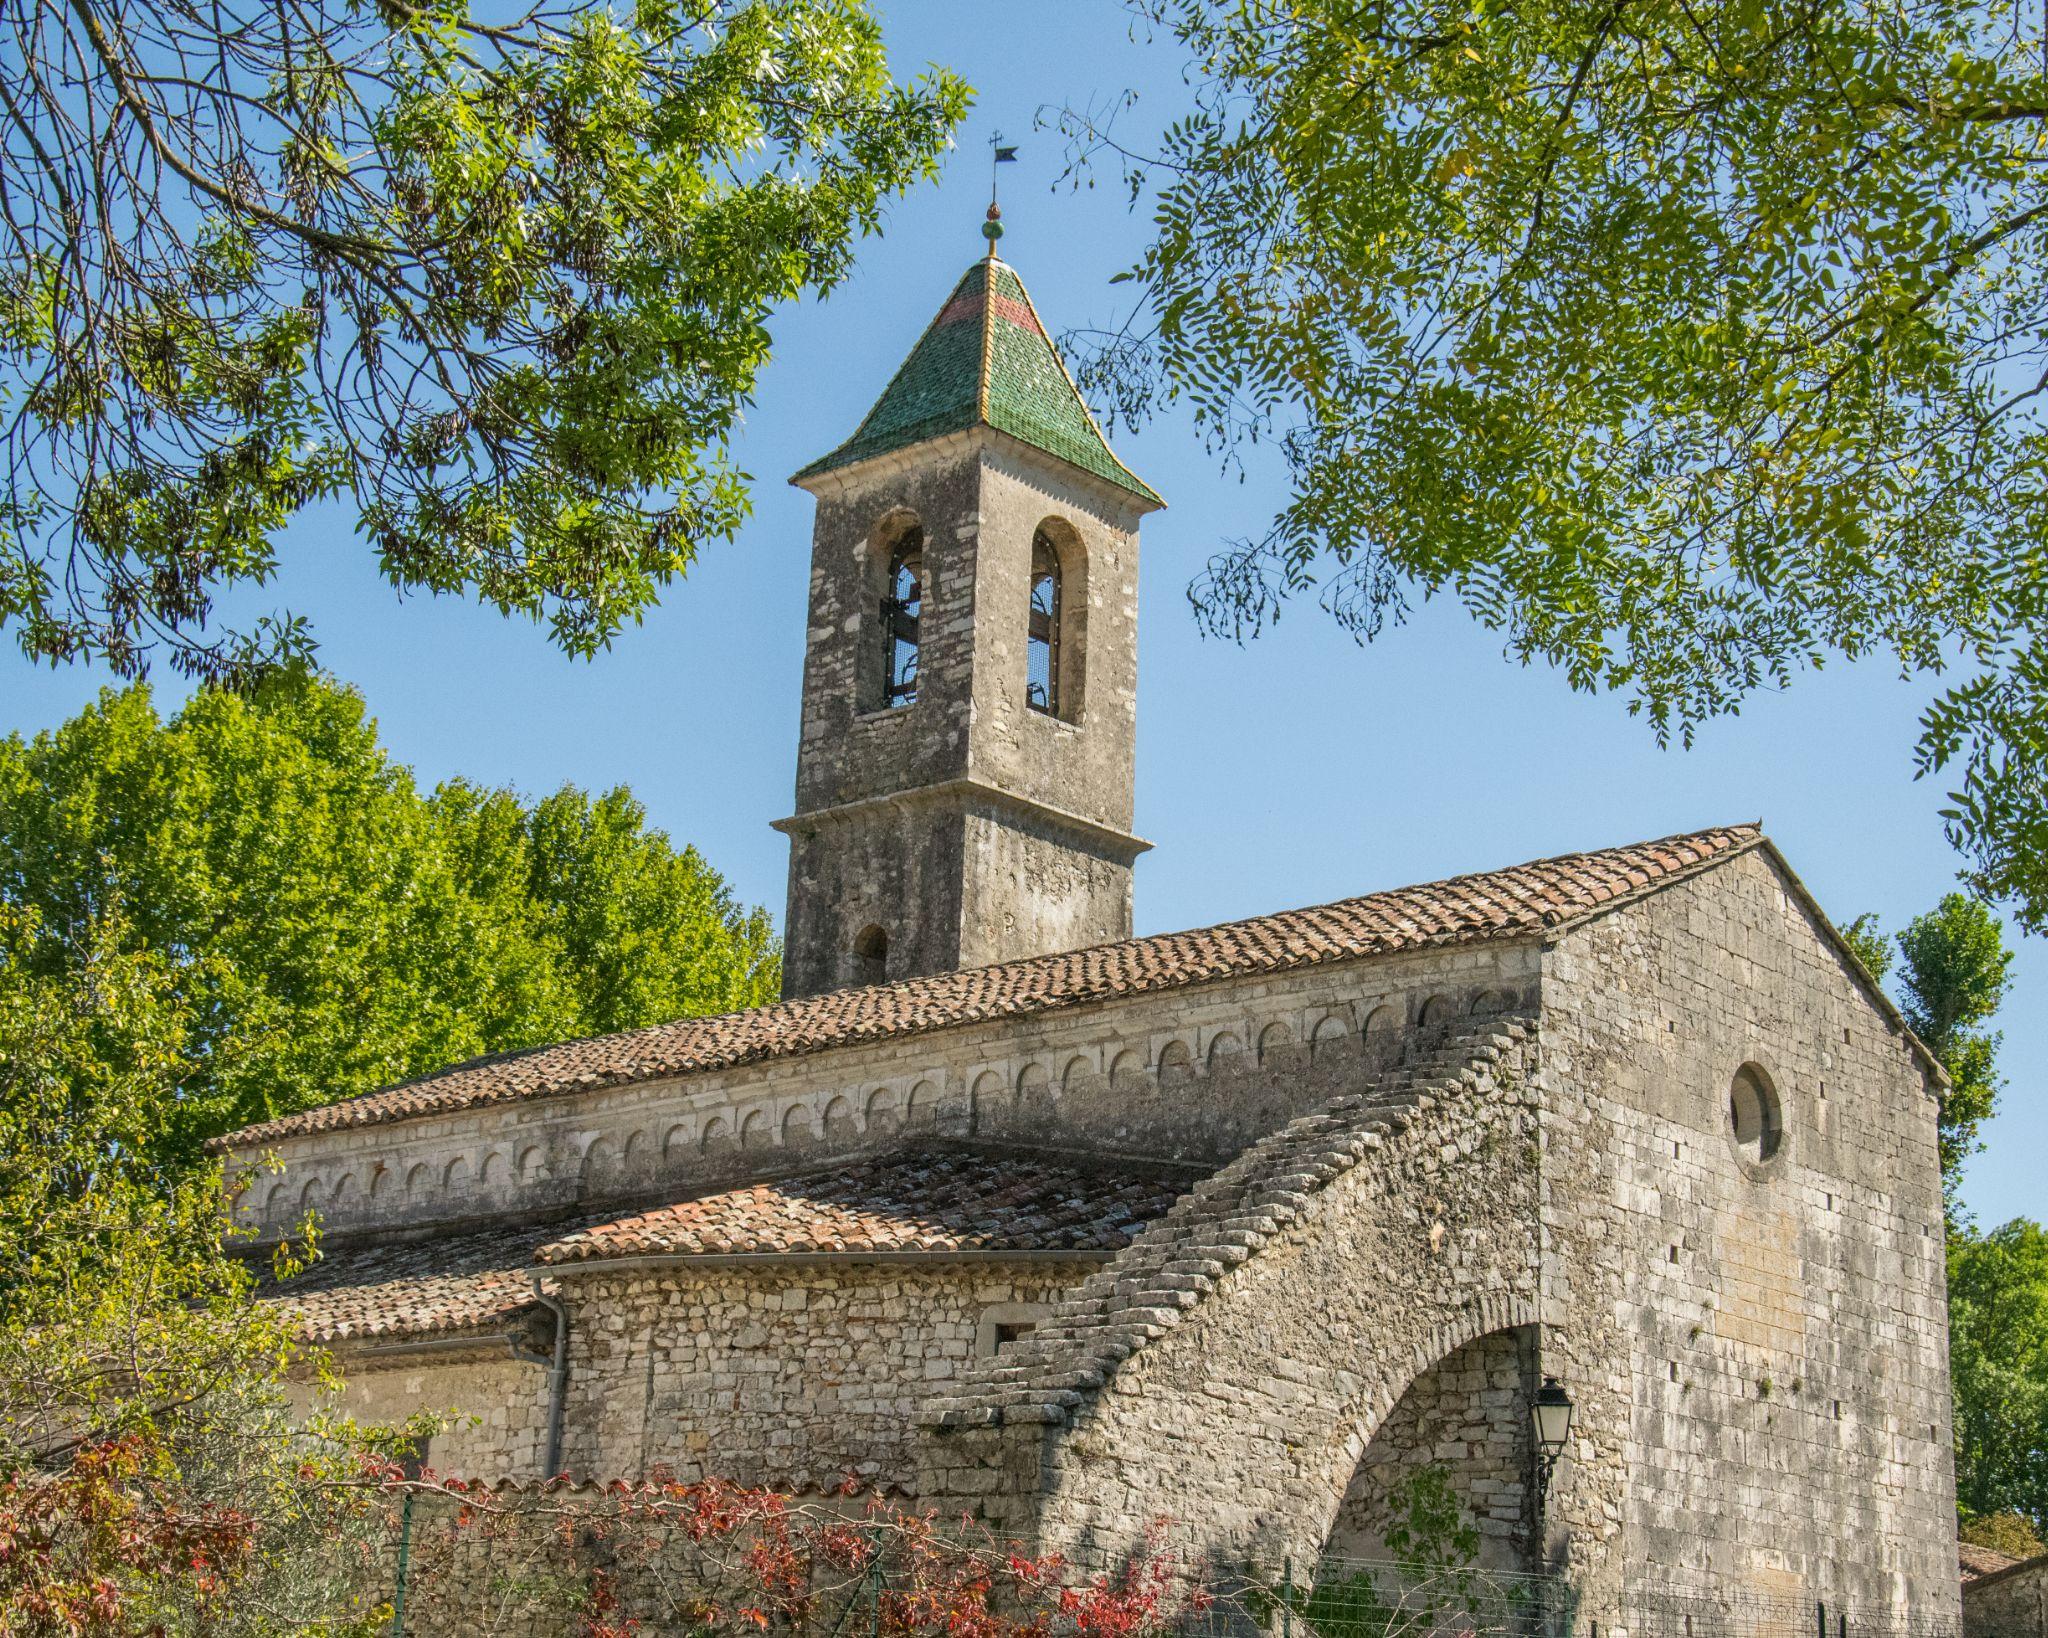 12th century church at Brissac, Herault by Donna Corbett